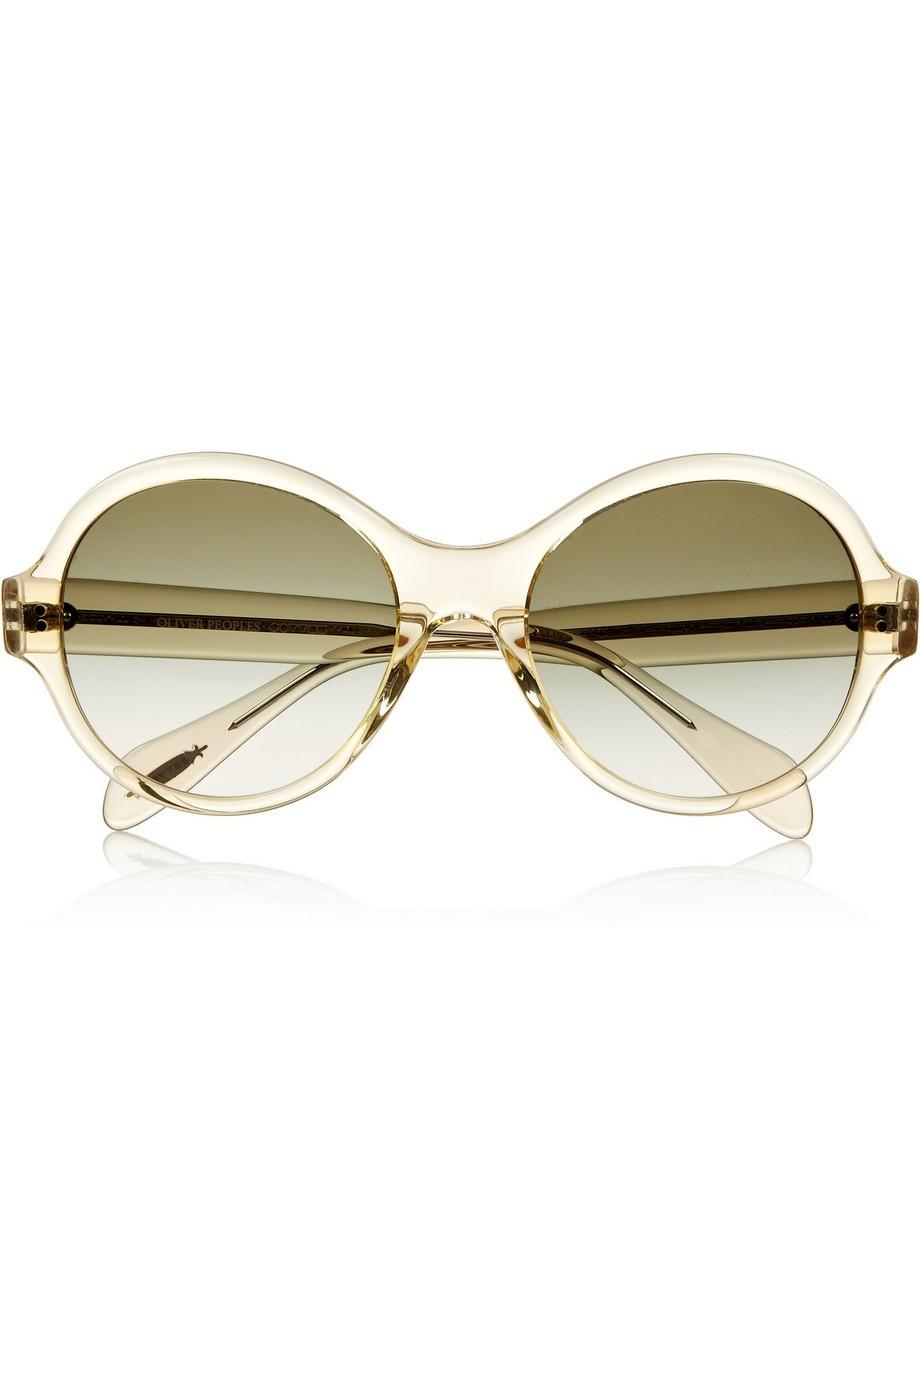 Lipsofire round-frame acetate sunglasses